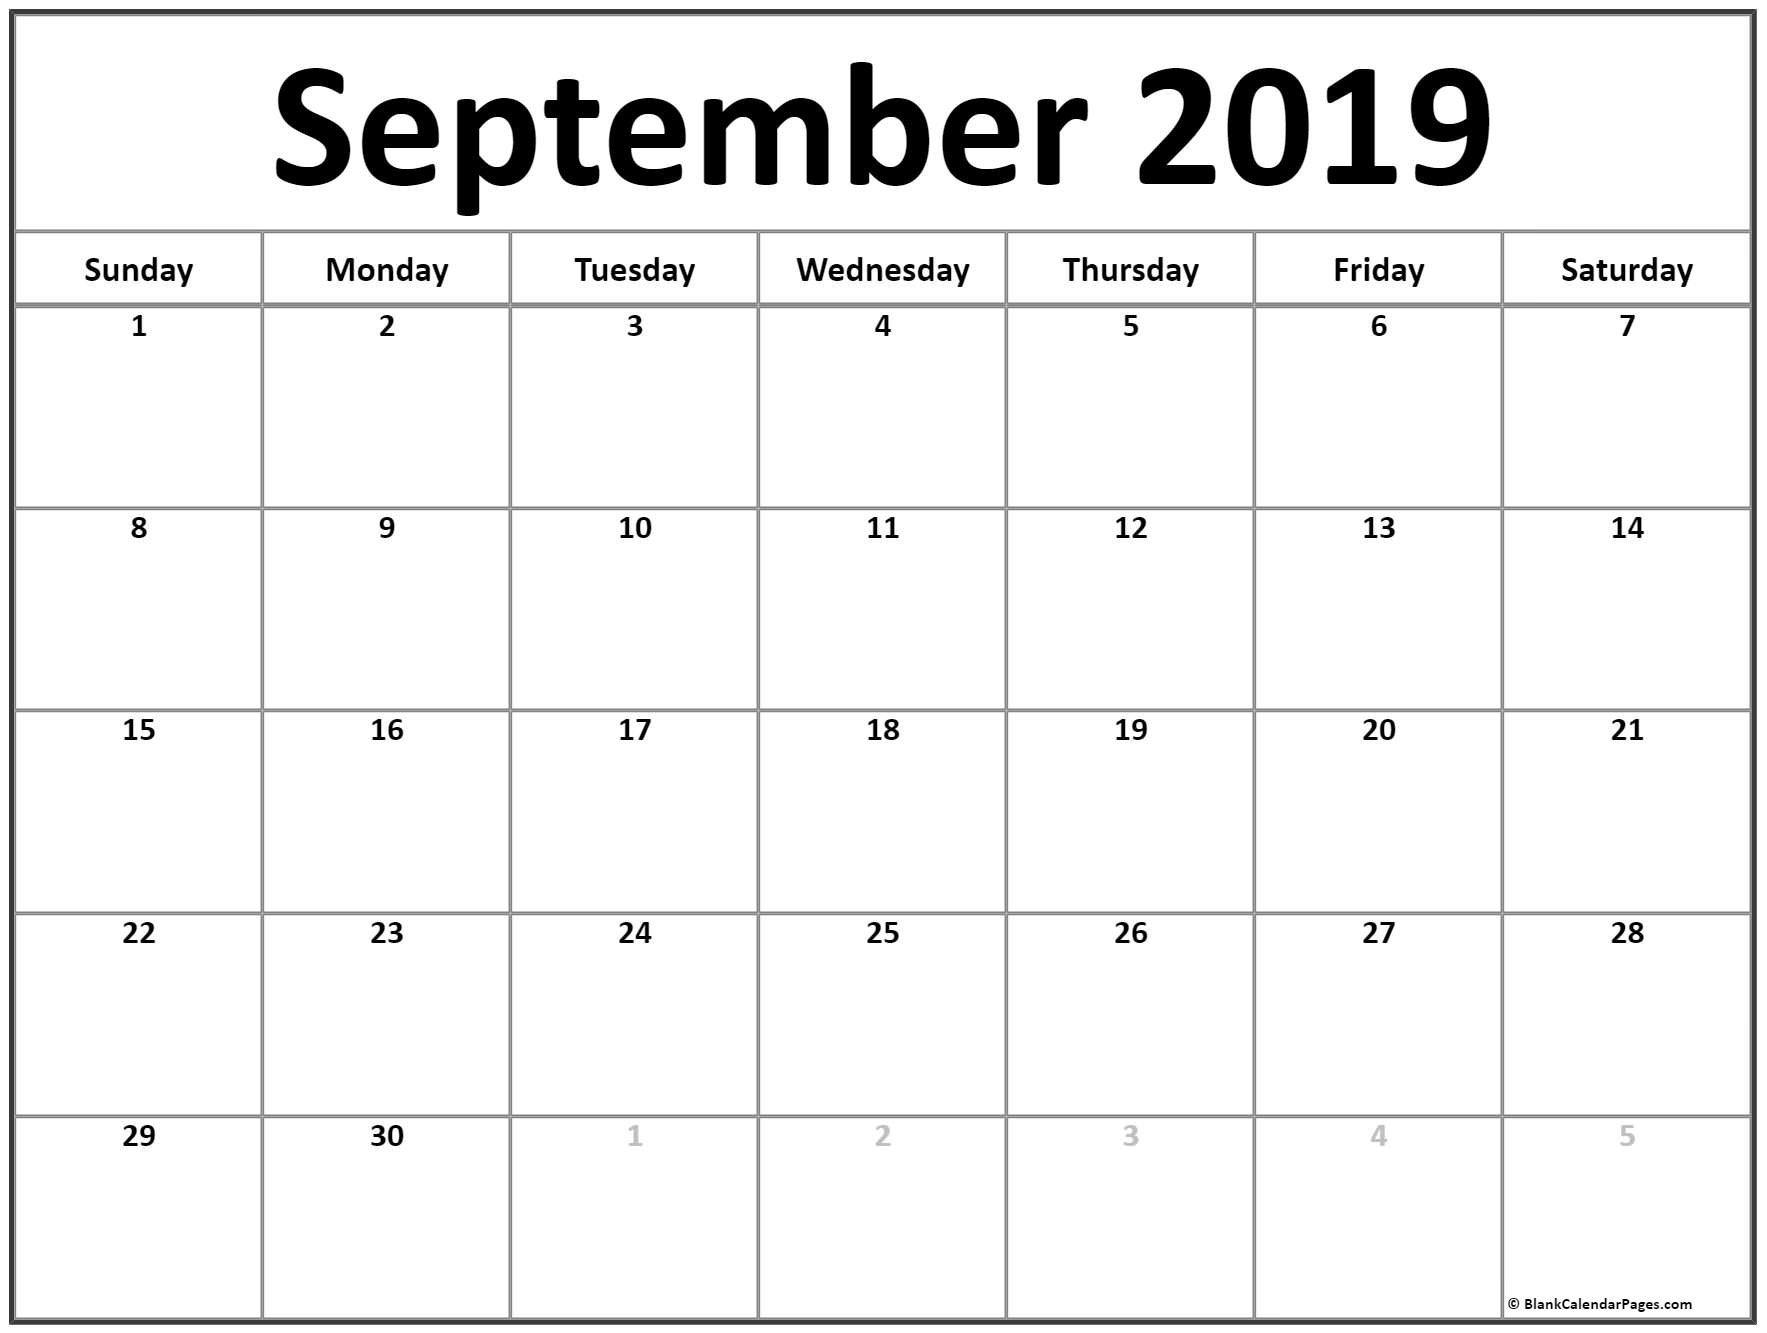 September 2019 Calendar | 56+ Templates Of 2019 Printable Calendars Calendar 2019 Sept